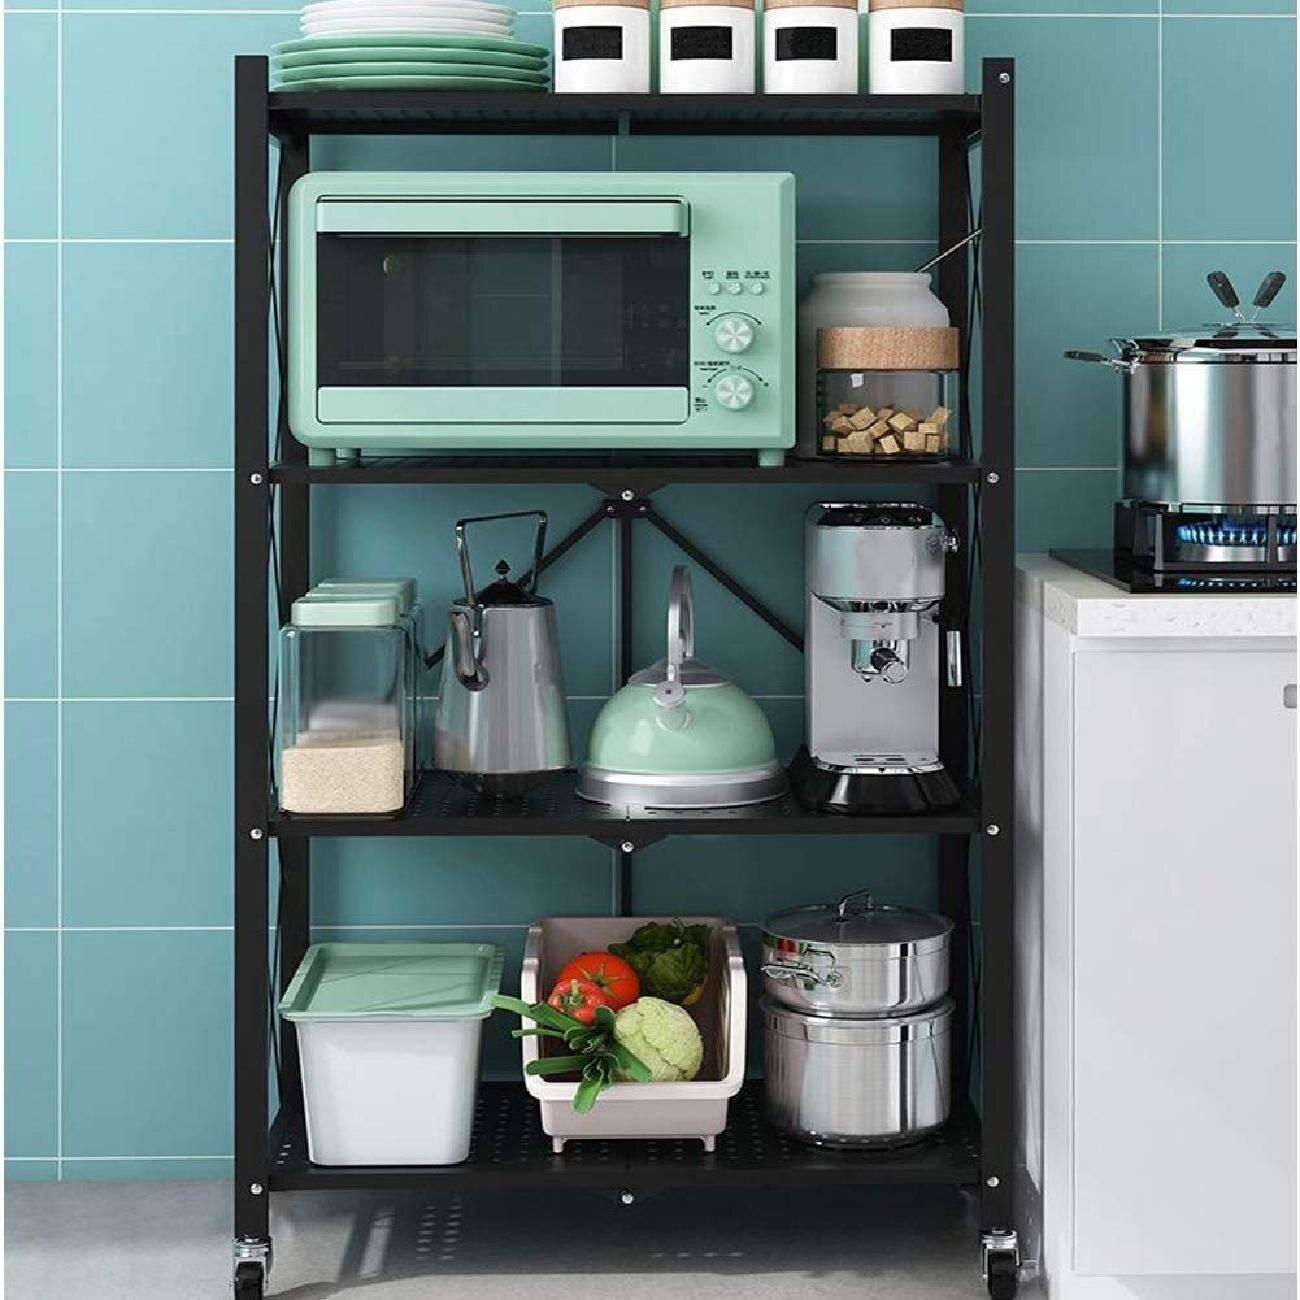 storage rack, shelving unit, standing shelf, kitchen rack, shelving with wheels, outdoor shelving for plants